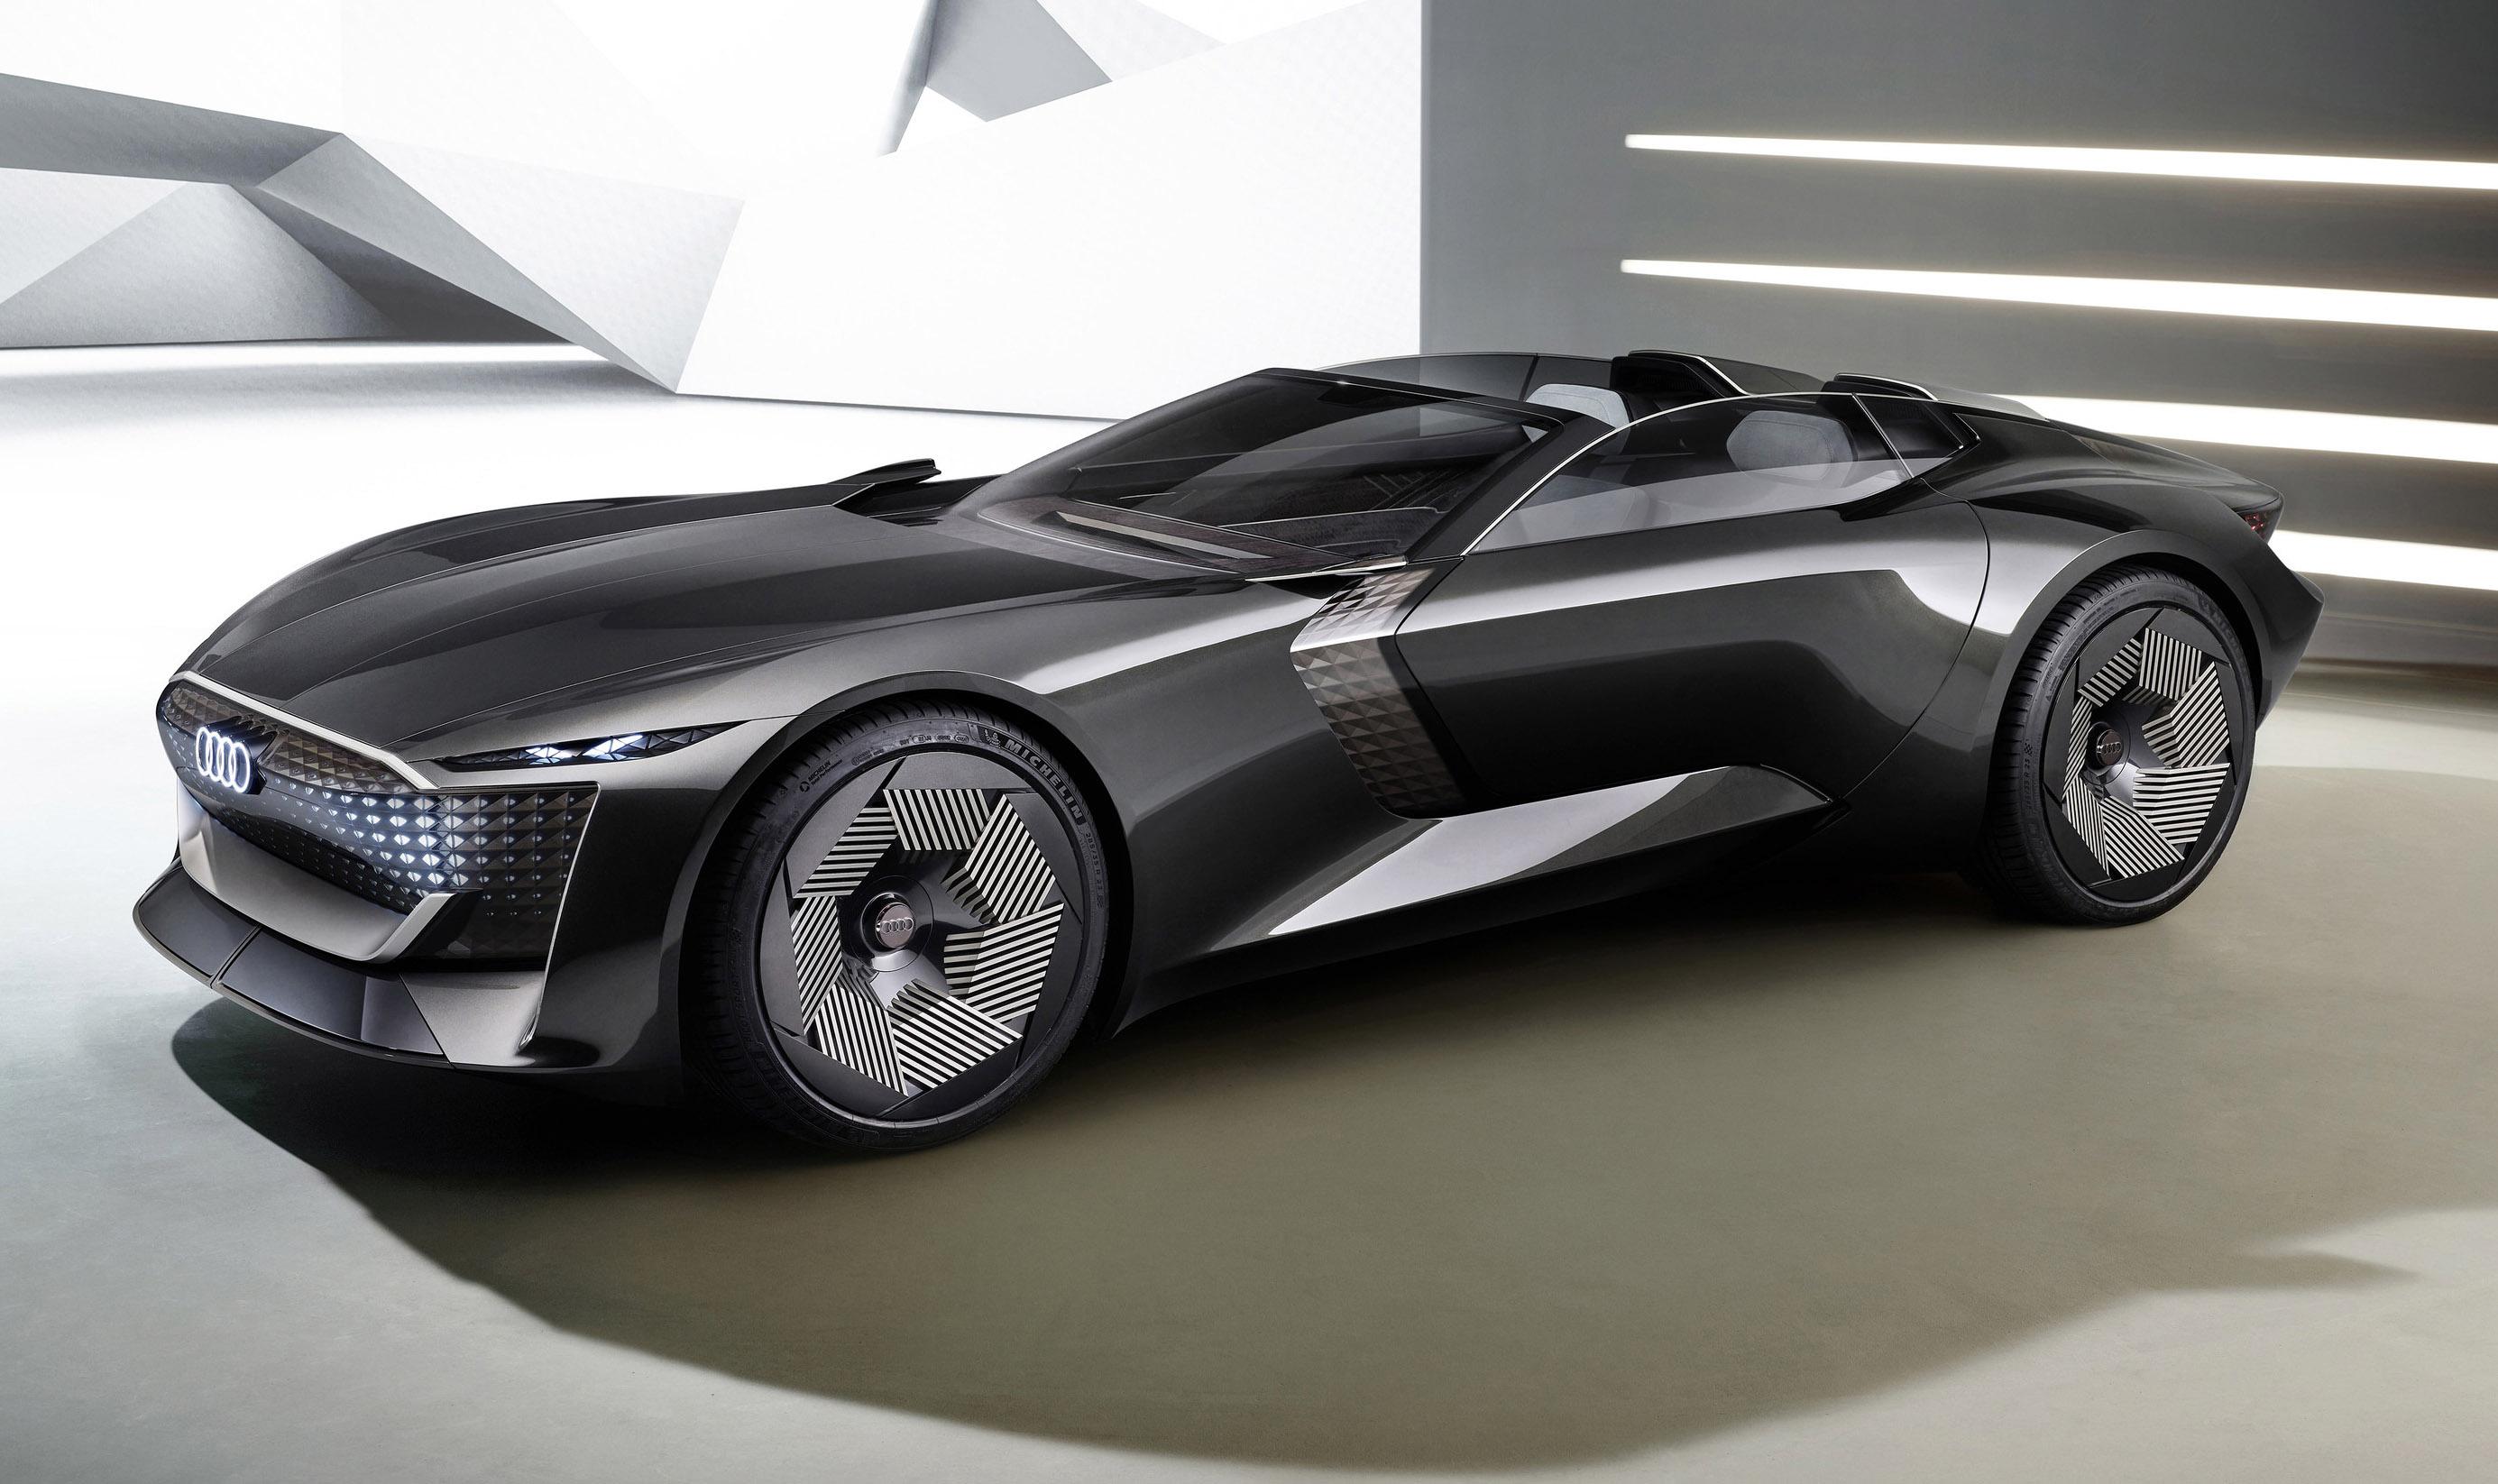 Audi's Skysphere concept EV roadster can transform into a grand tourer